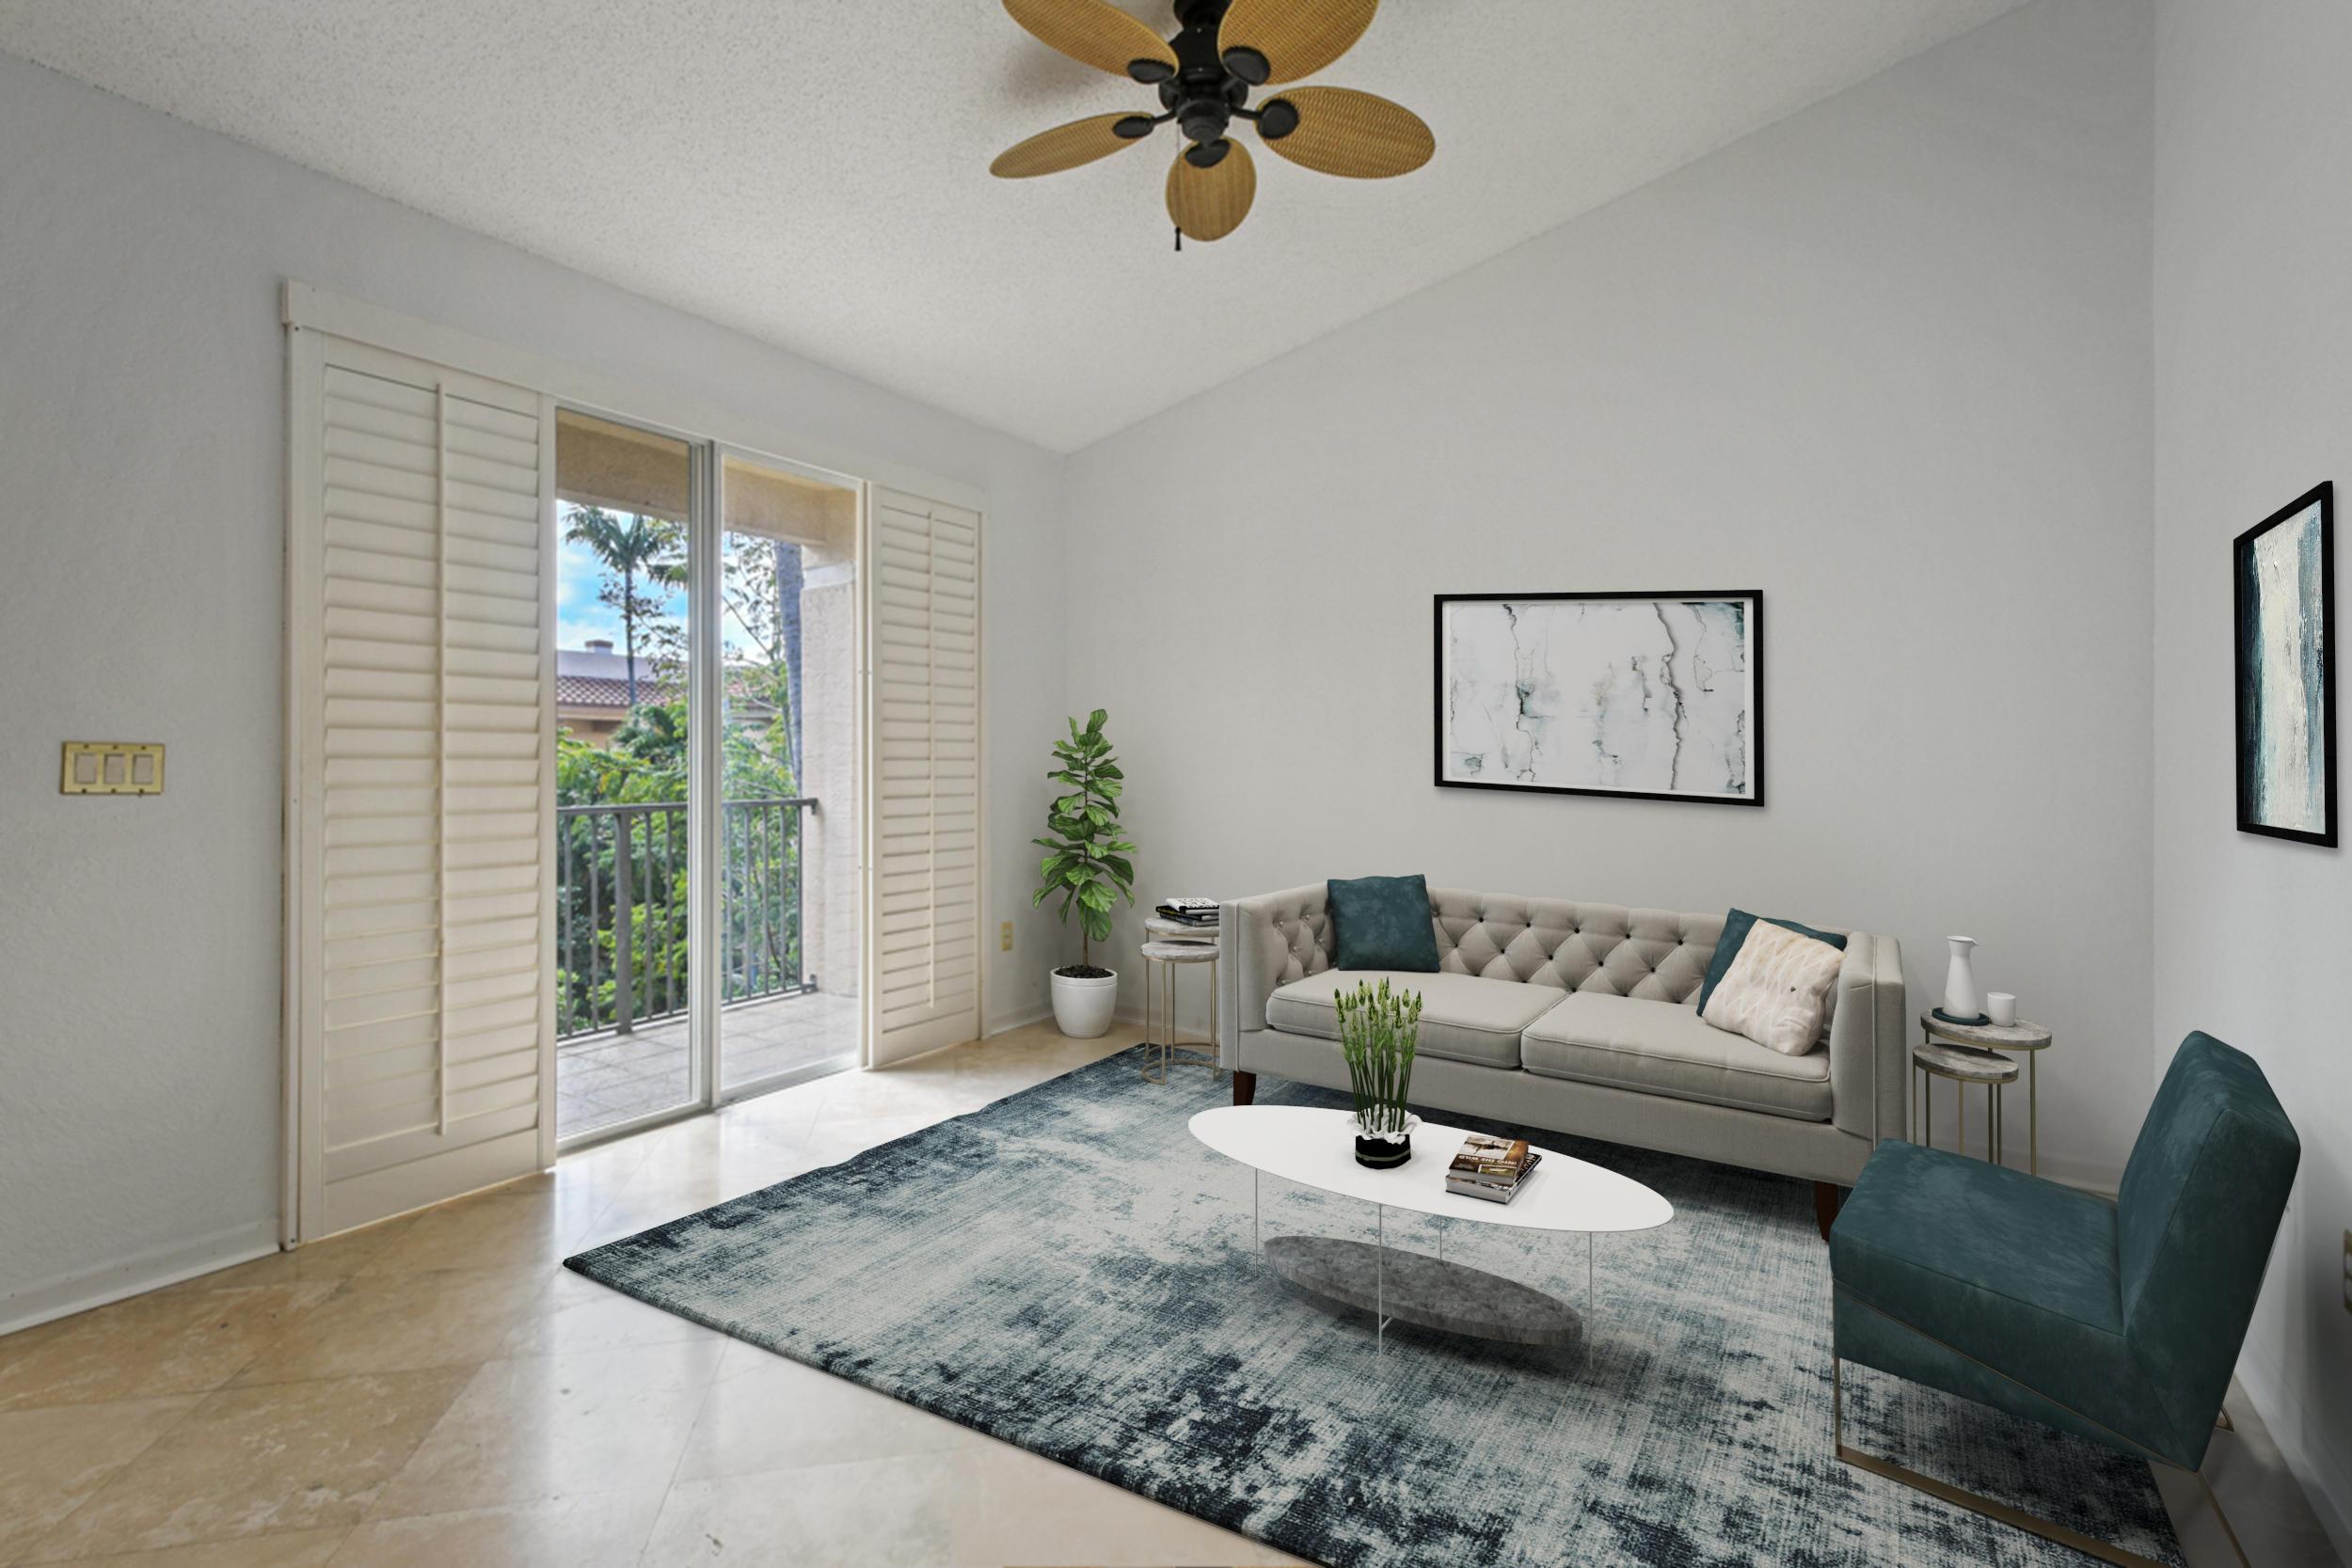 1805 N Flagler Drive, 308 - West Palm Beach, Florida